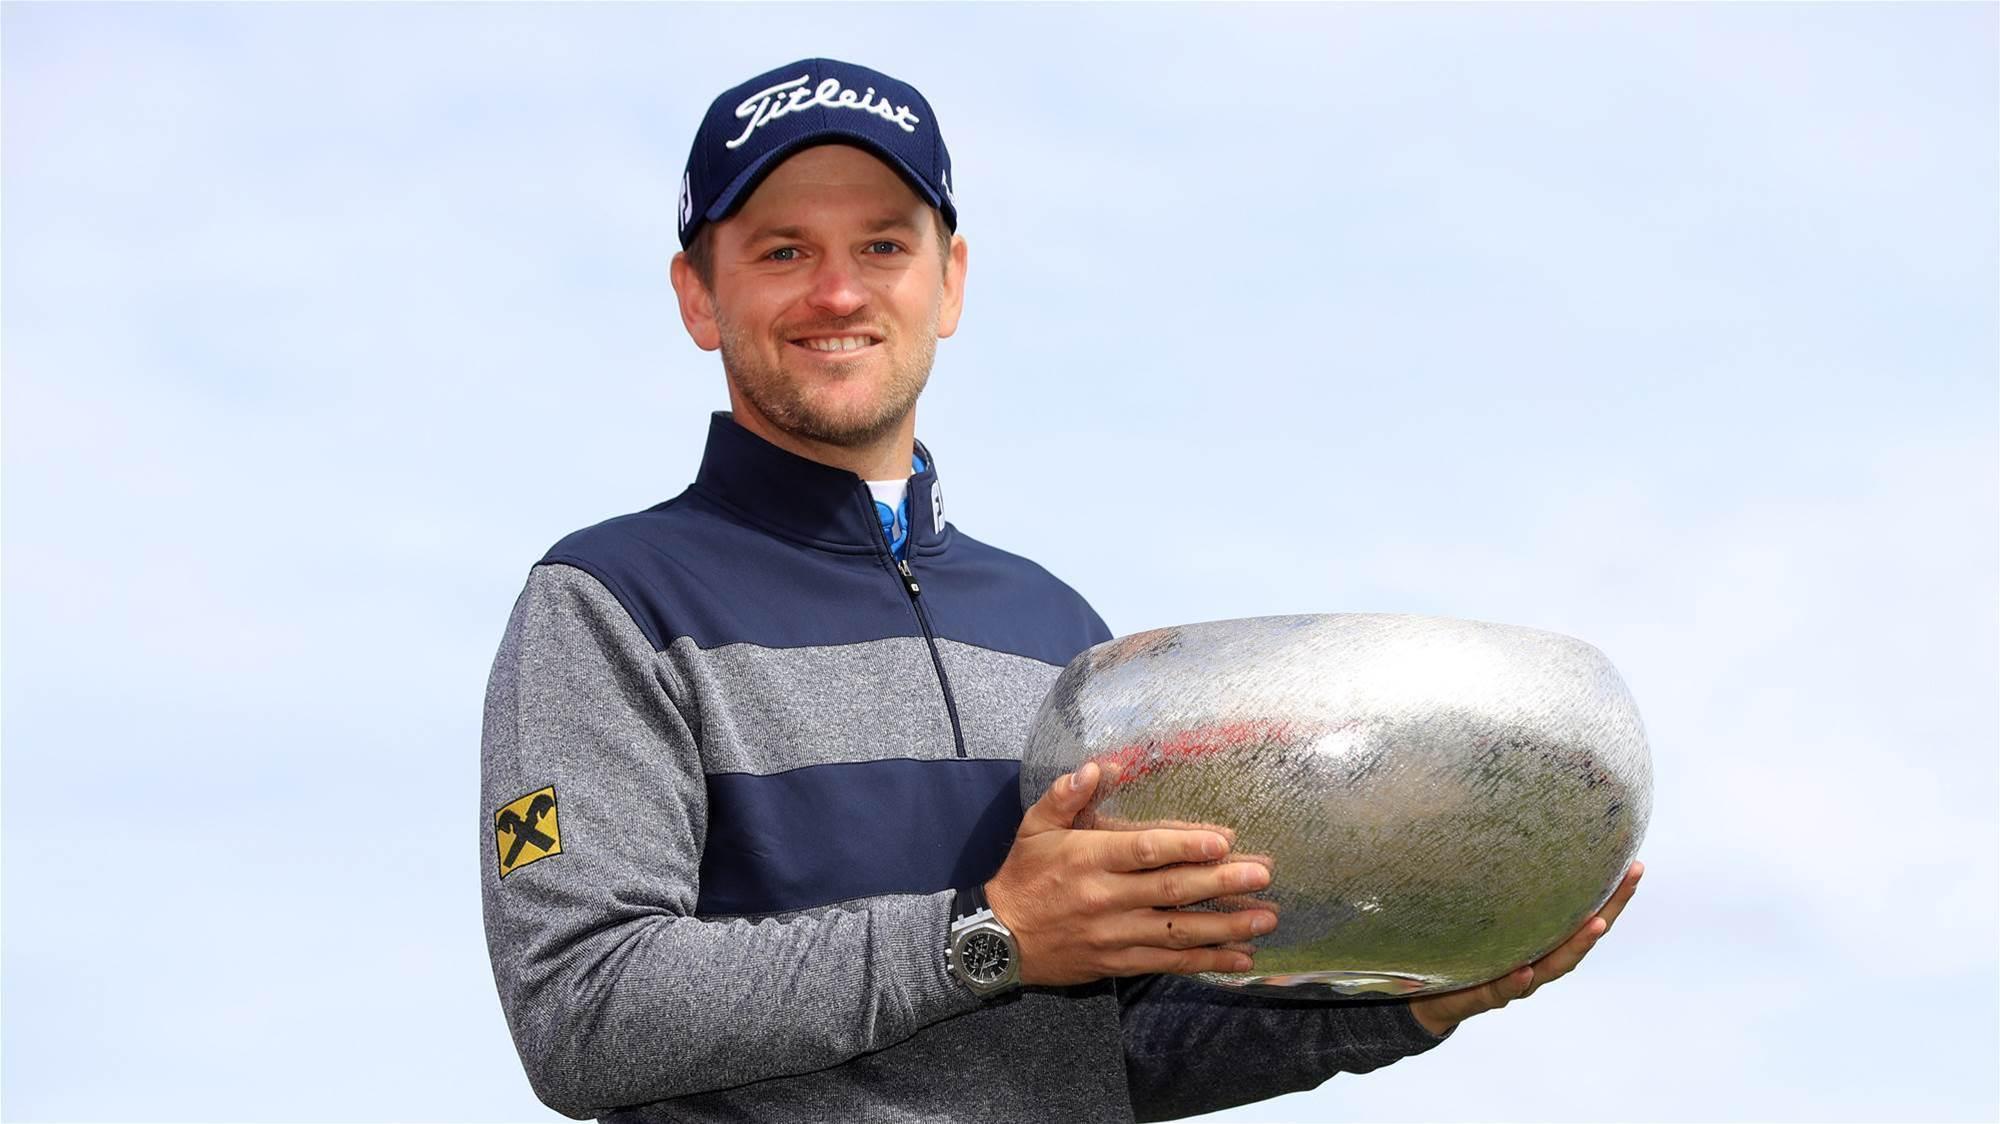 Wiesberger wins Made in Denmark